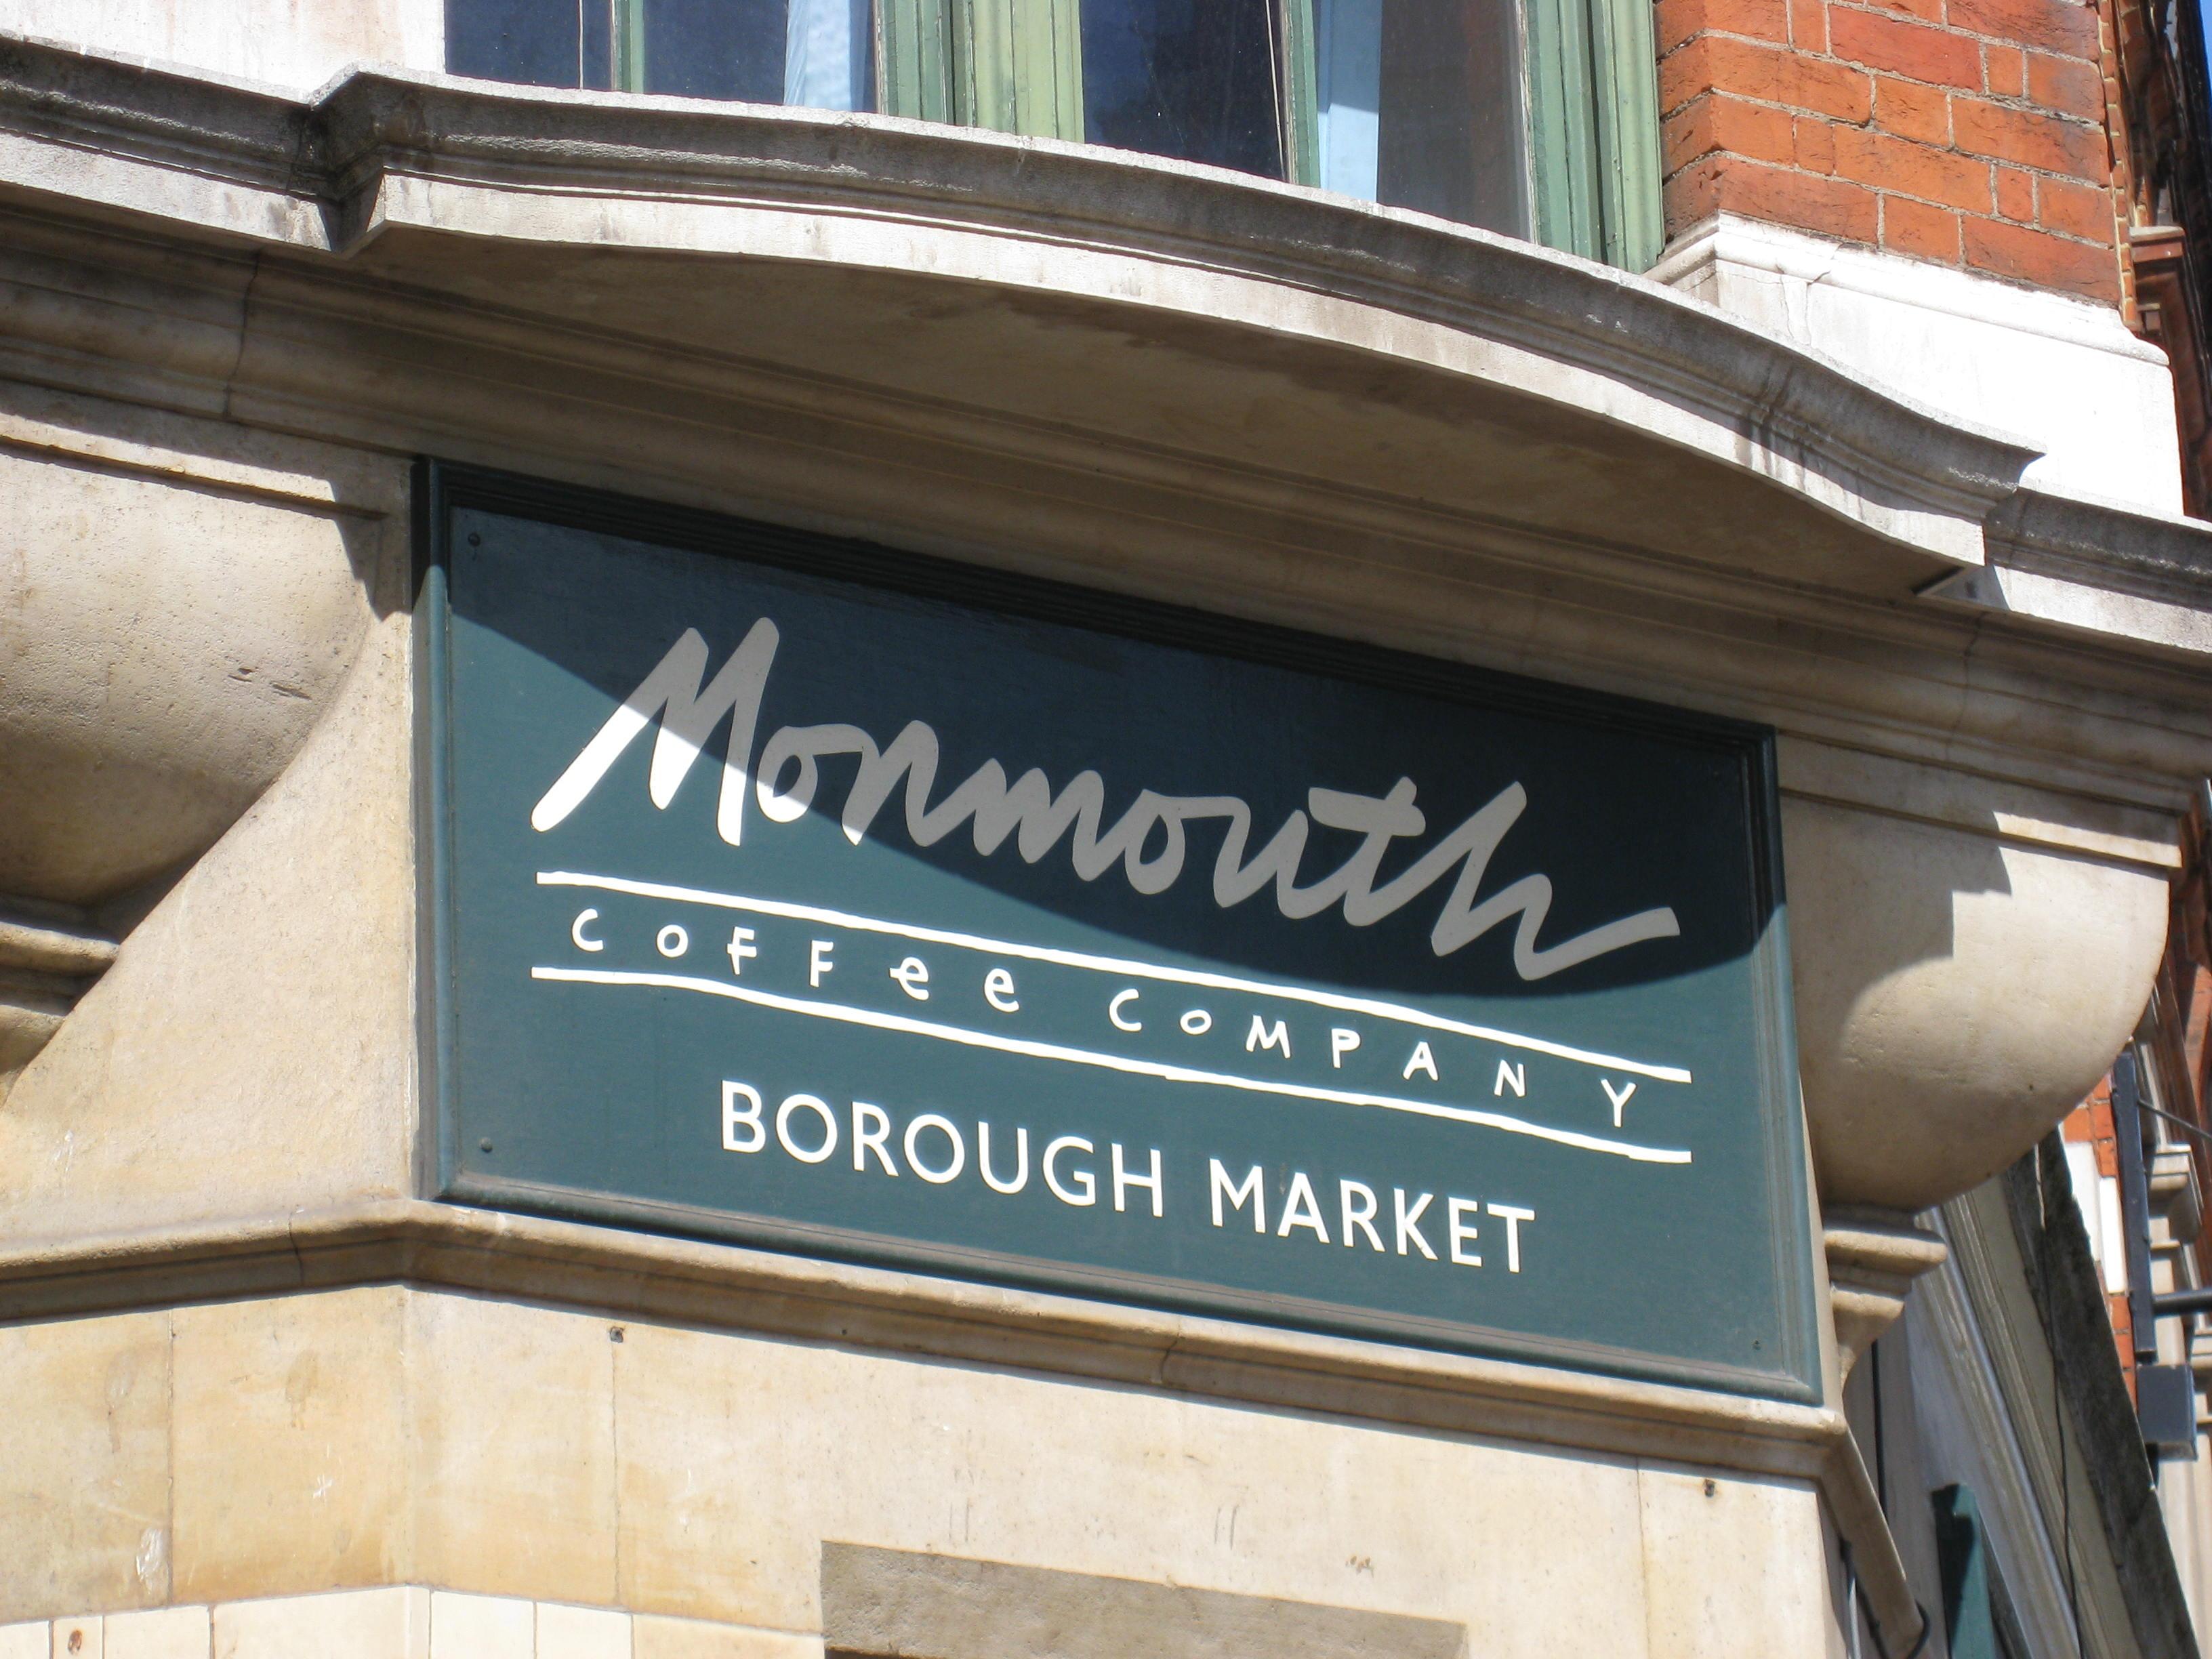 Monmouth Coffee House London